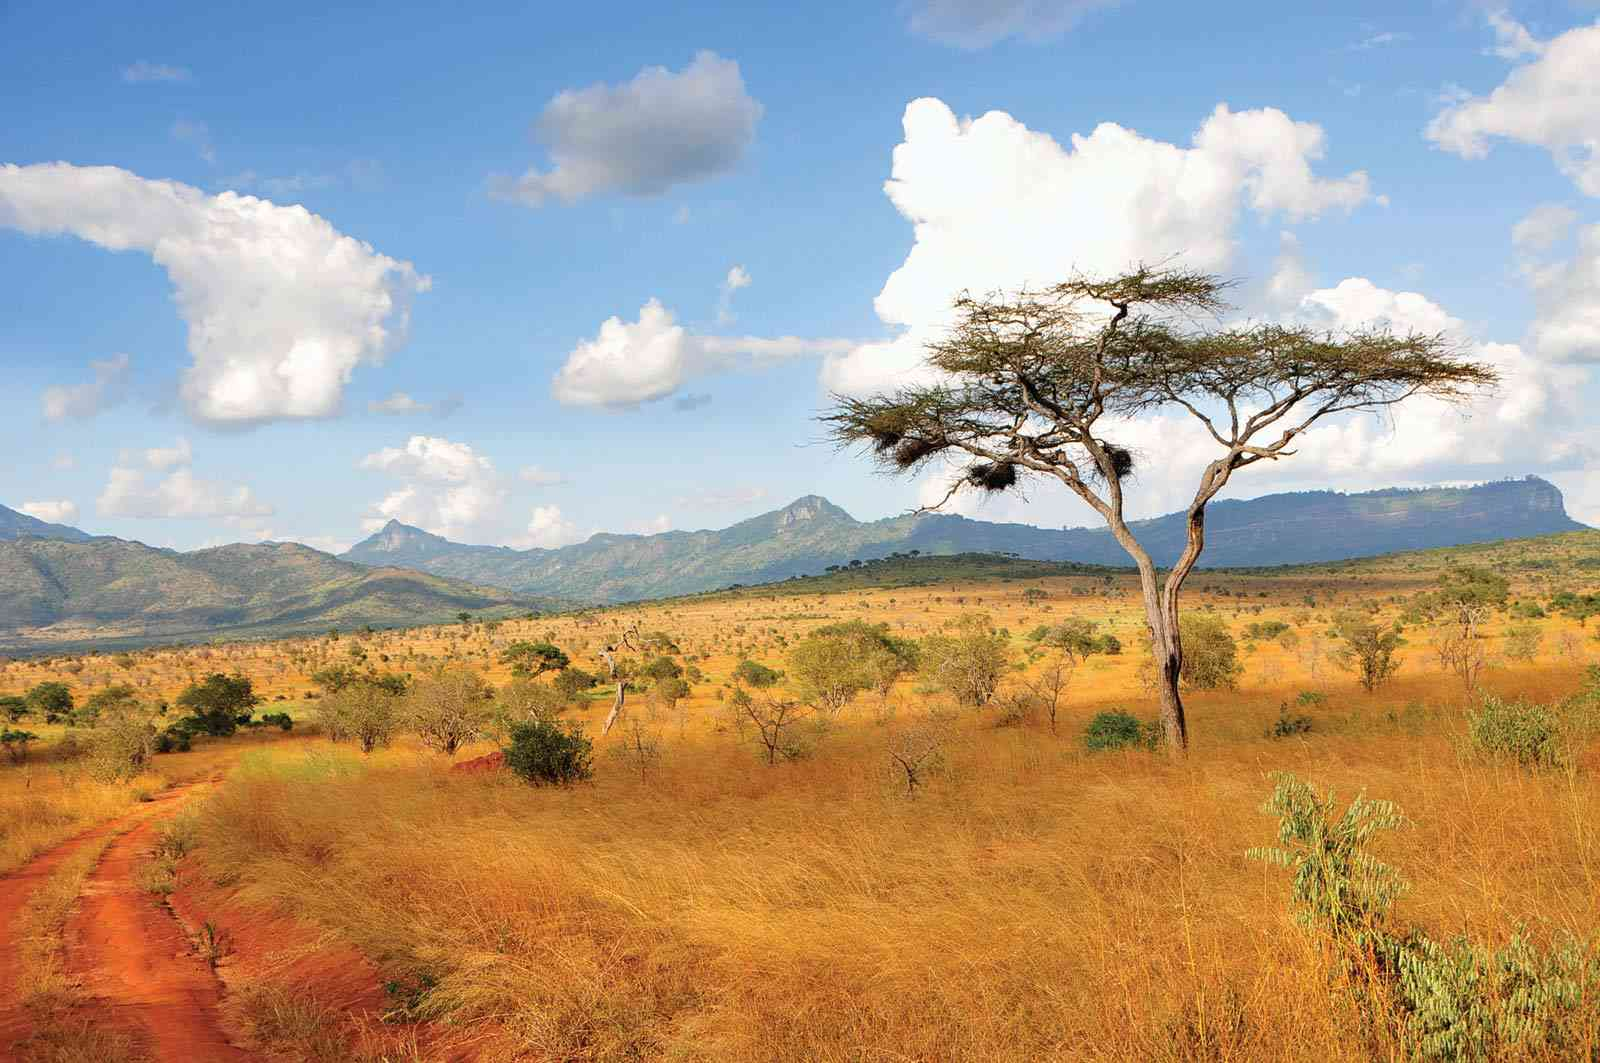 sejour safari et plongee au kenya